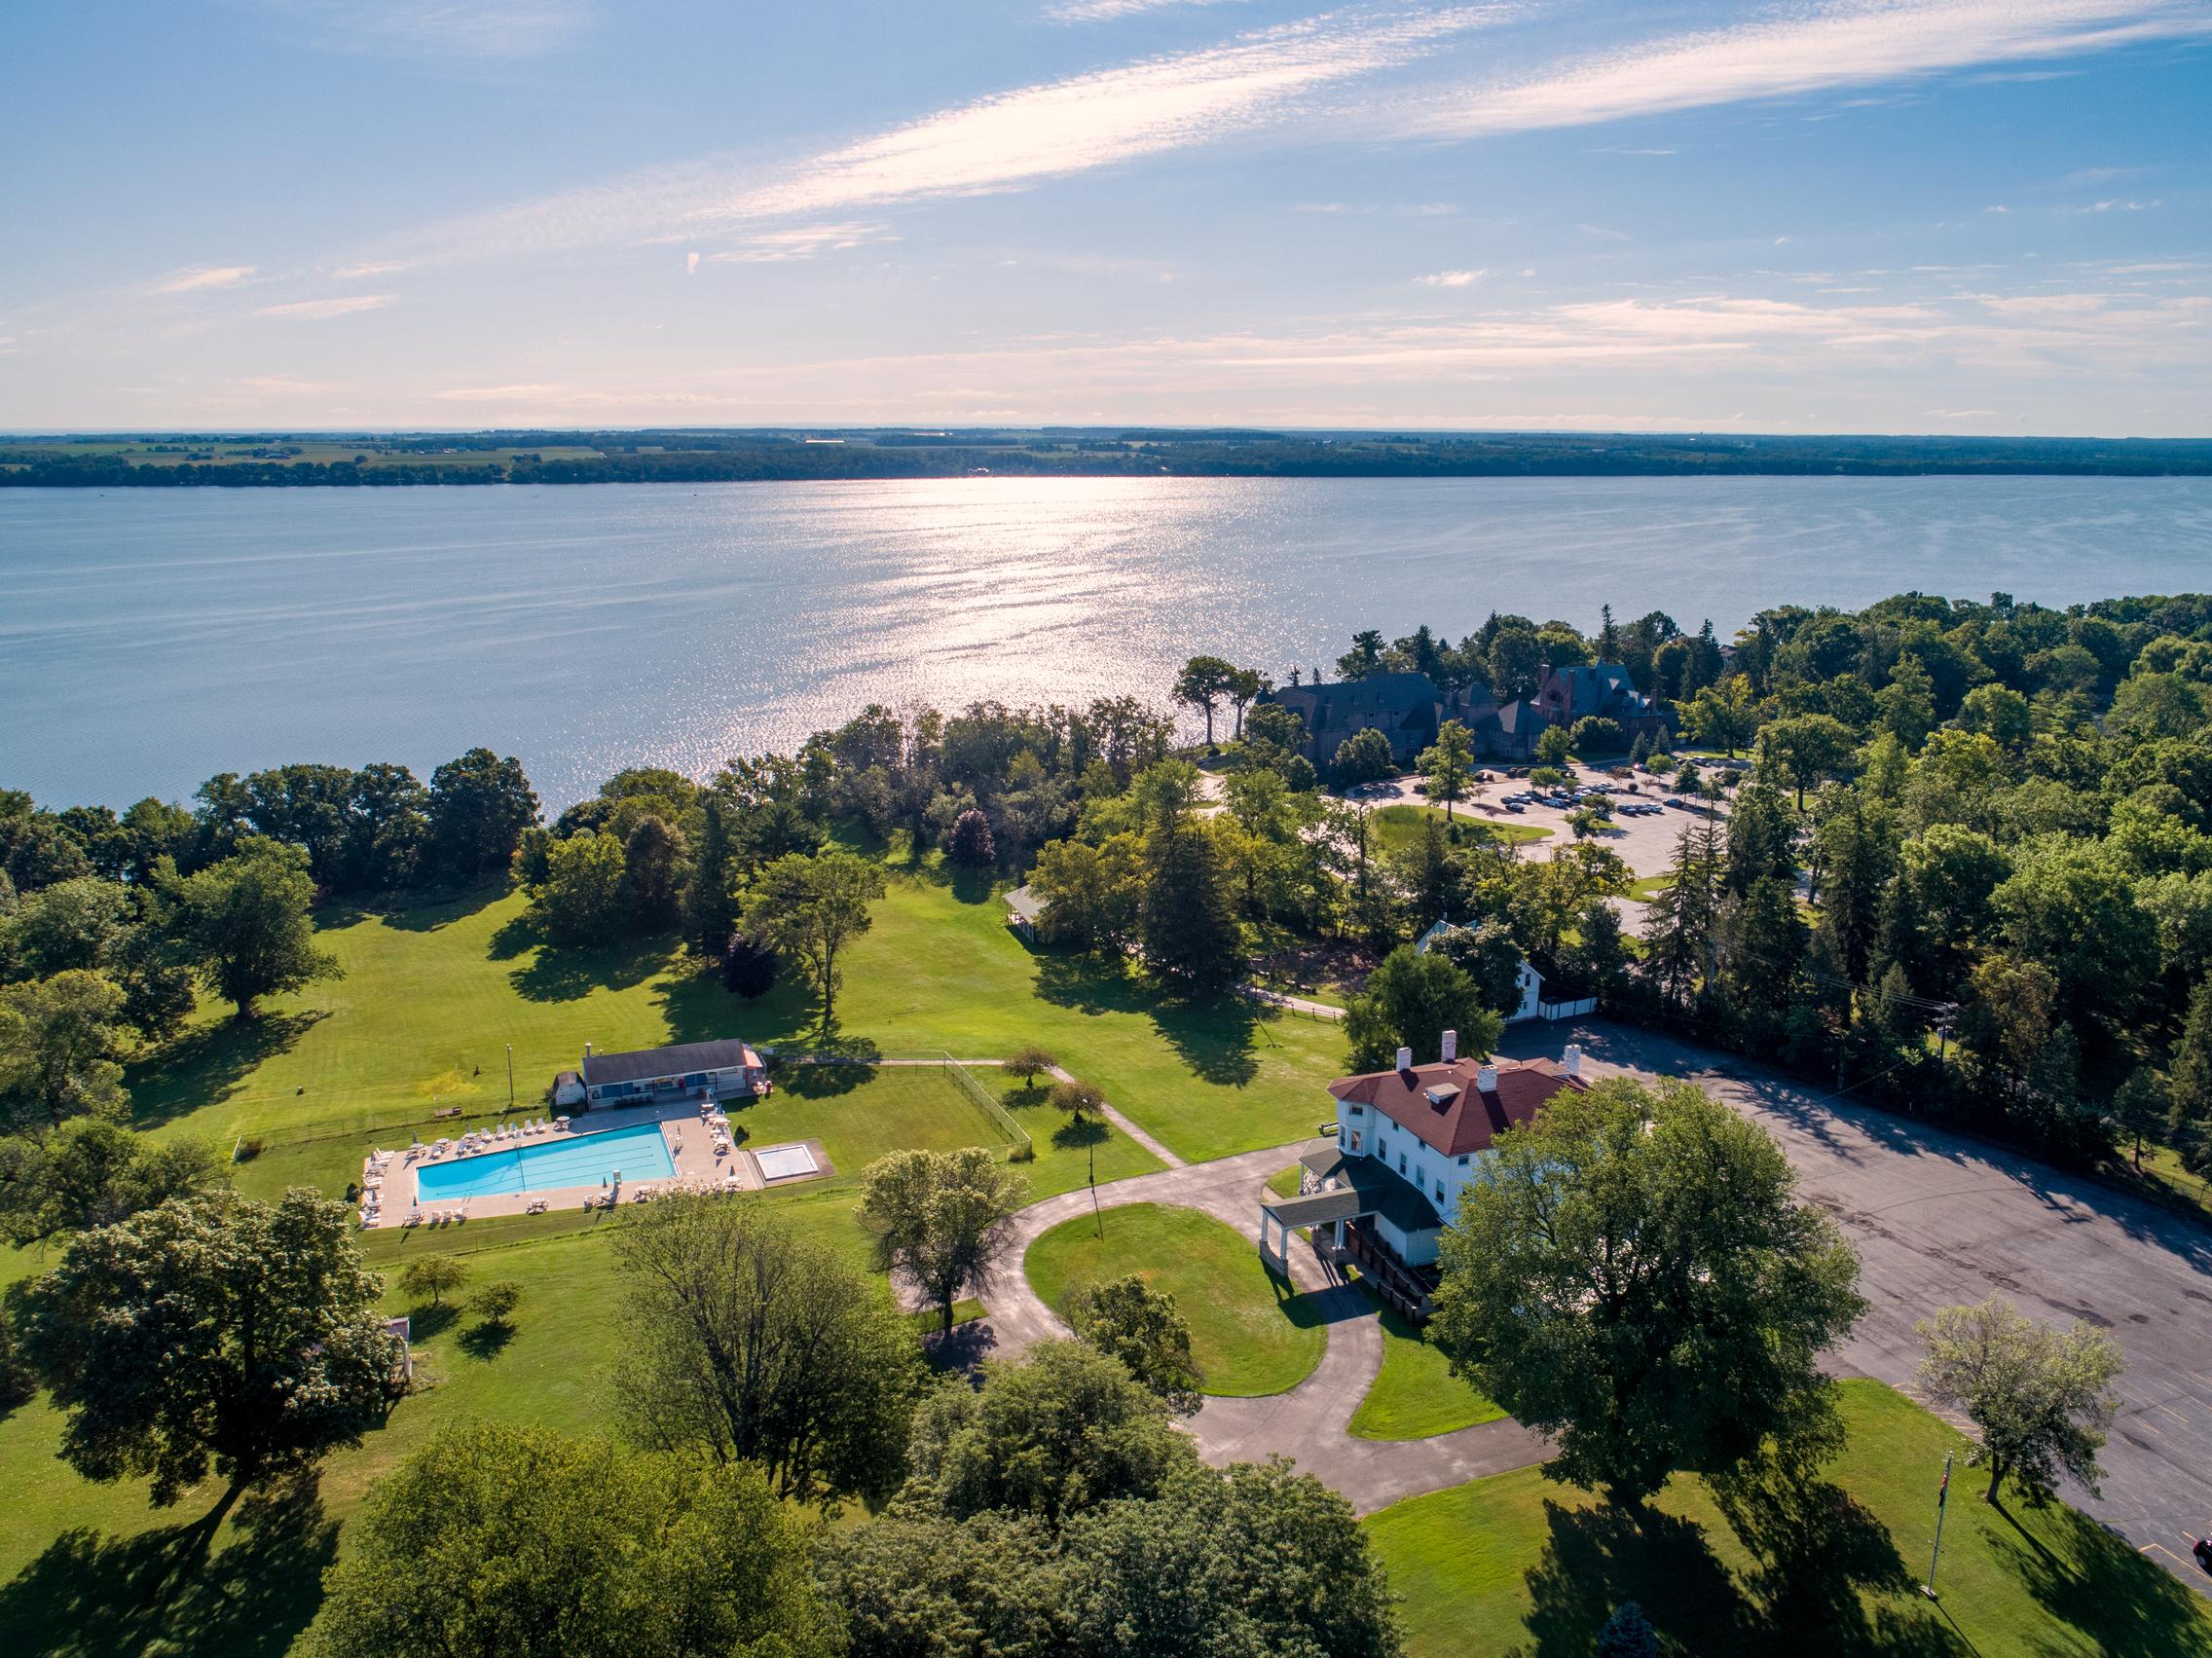 10  Seneca Lake Auction, American Legion, 1115 Lochland Rd, Geneva, NY 14456, Seneca Lake, Finger Lakes Property Listed For Sale by Michael DeRosa, Real Estate Broker, Michael DeRosa Exchang.JPG